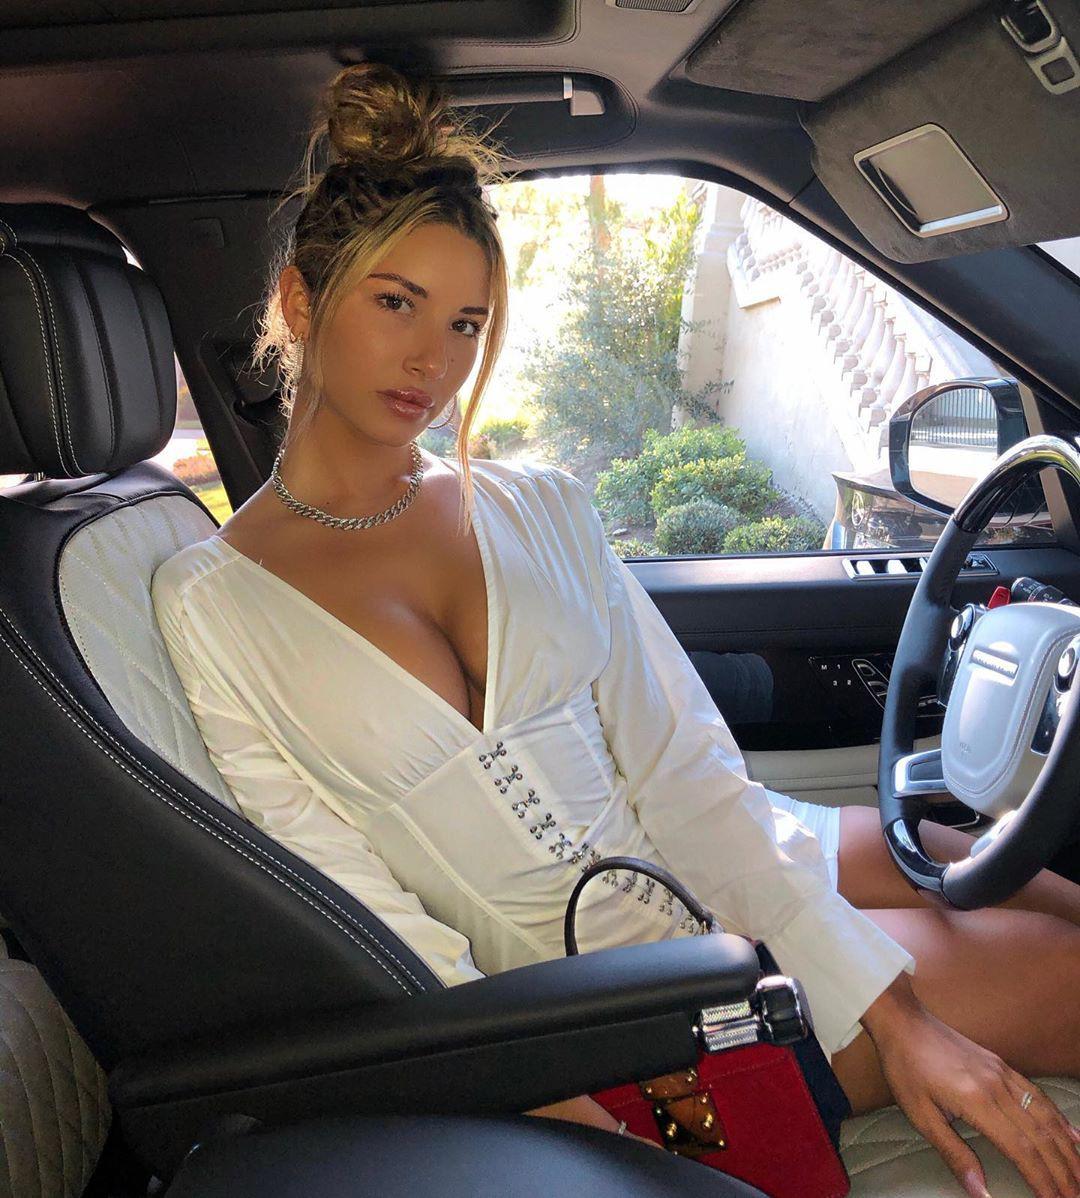 Sierra Skye, personal luxury car, automotive design, car seat cover